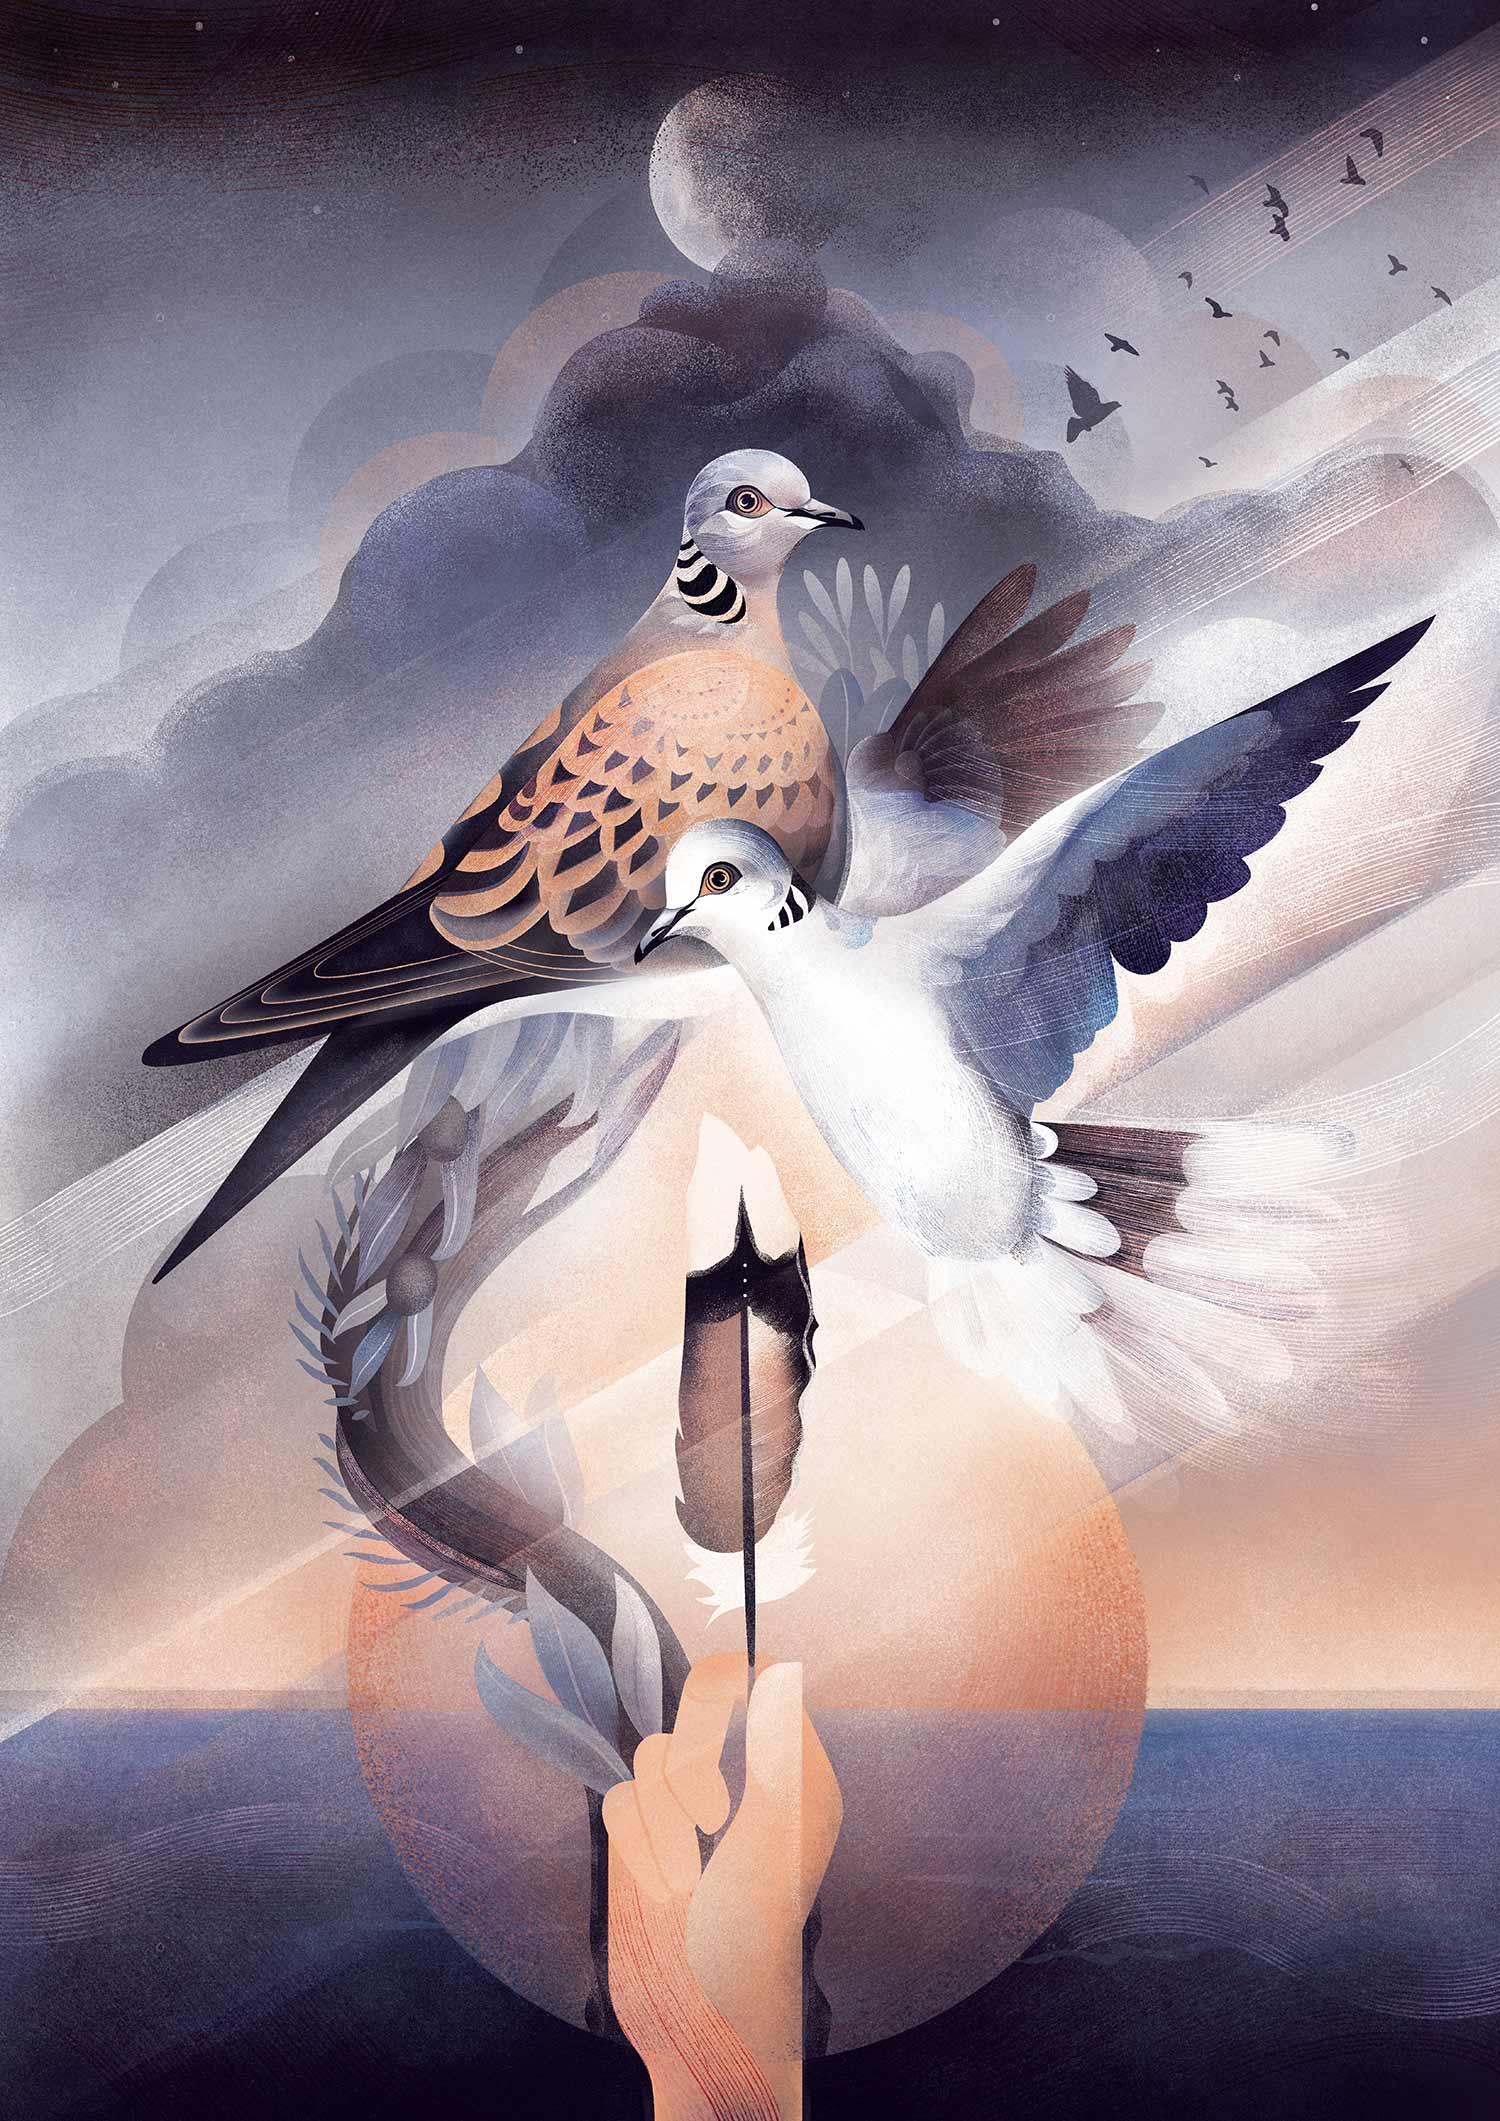 turtle_doves_karla_sanders_illustration.jpg